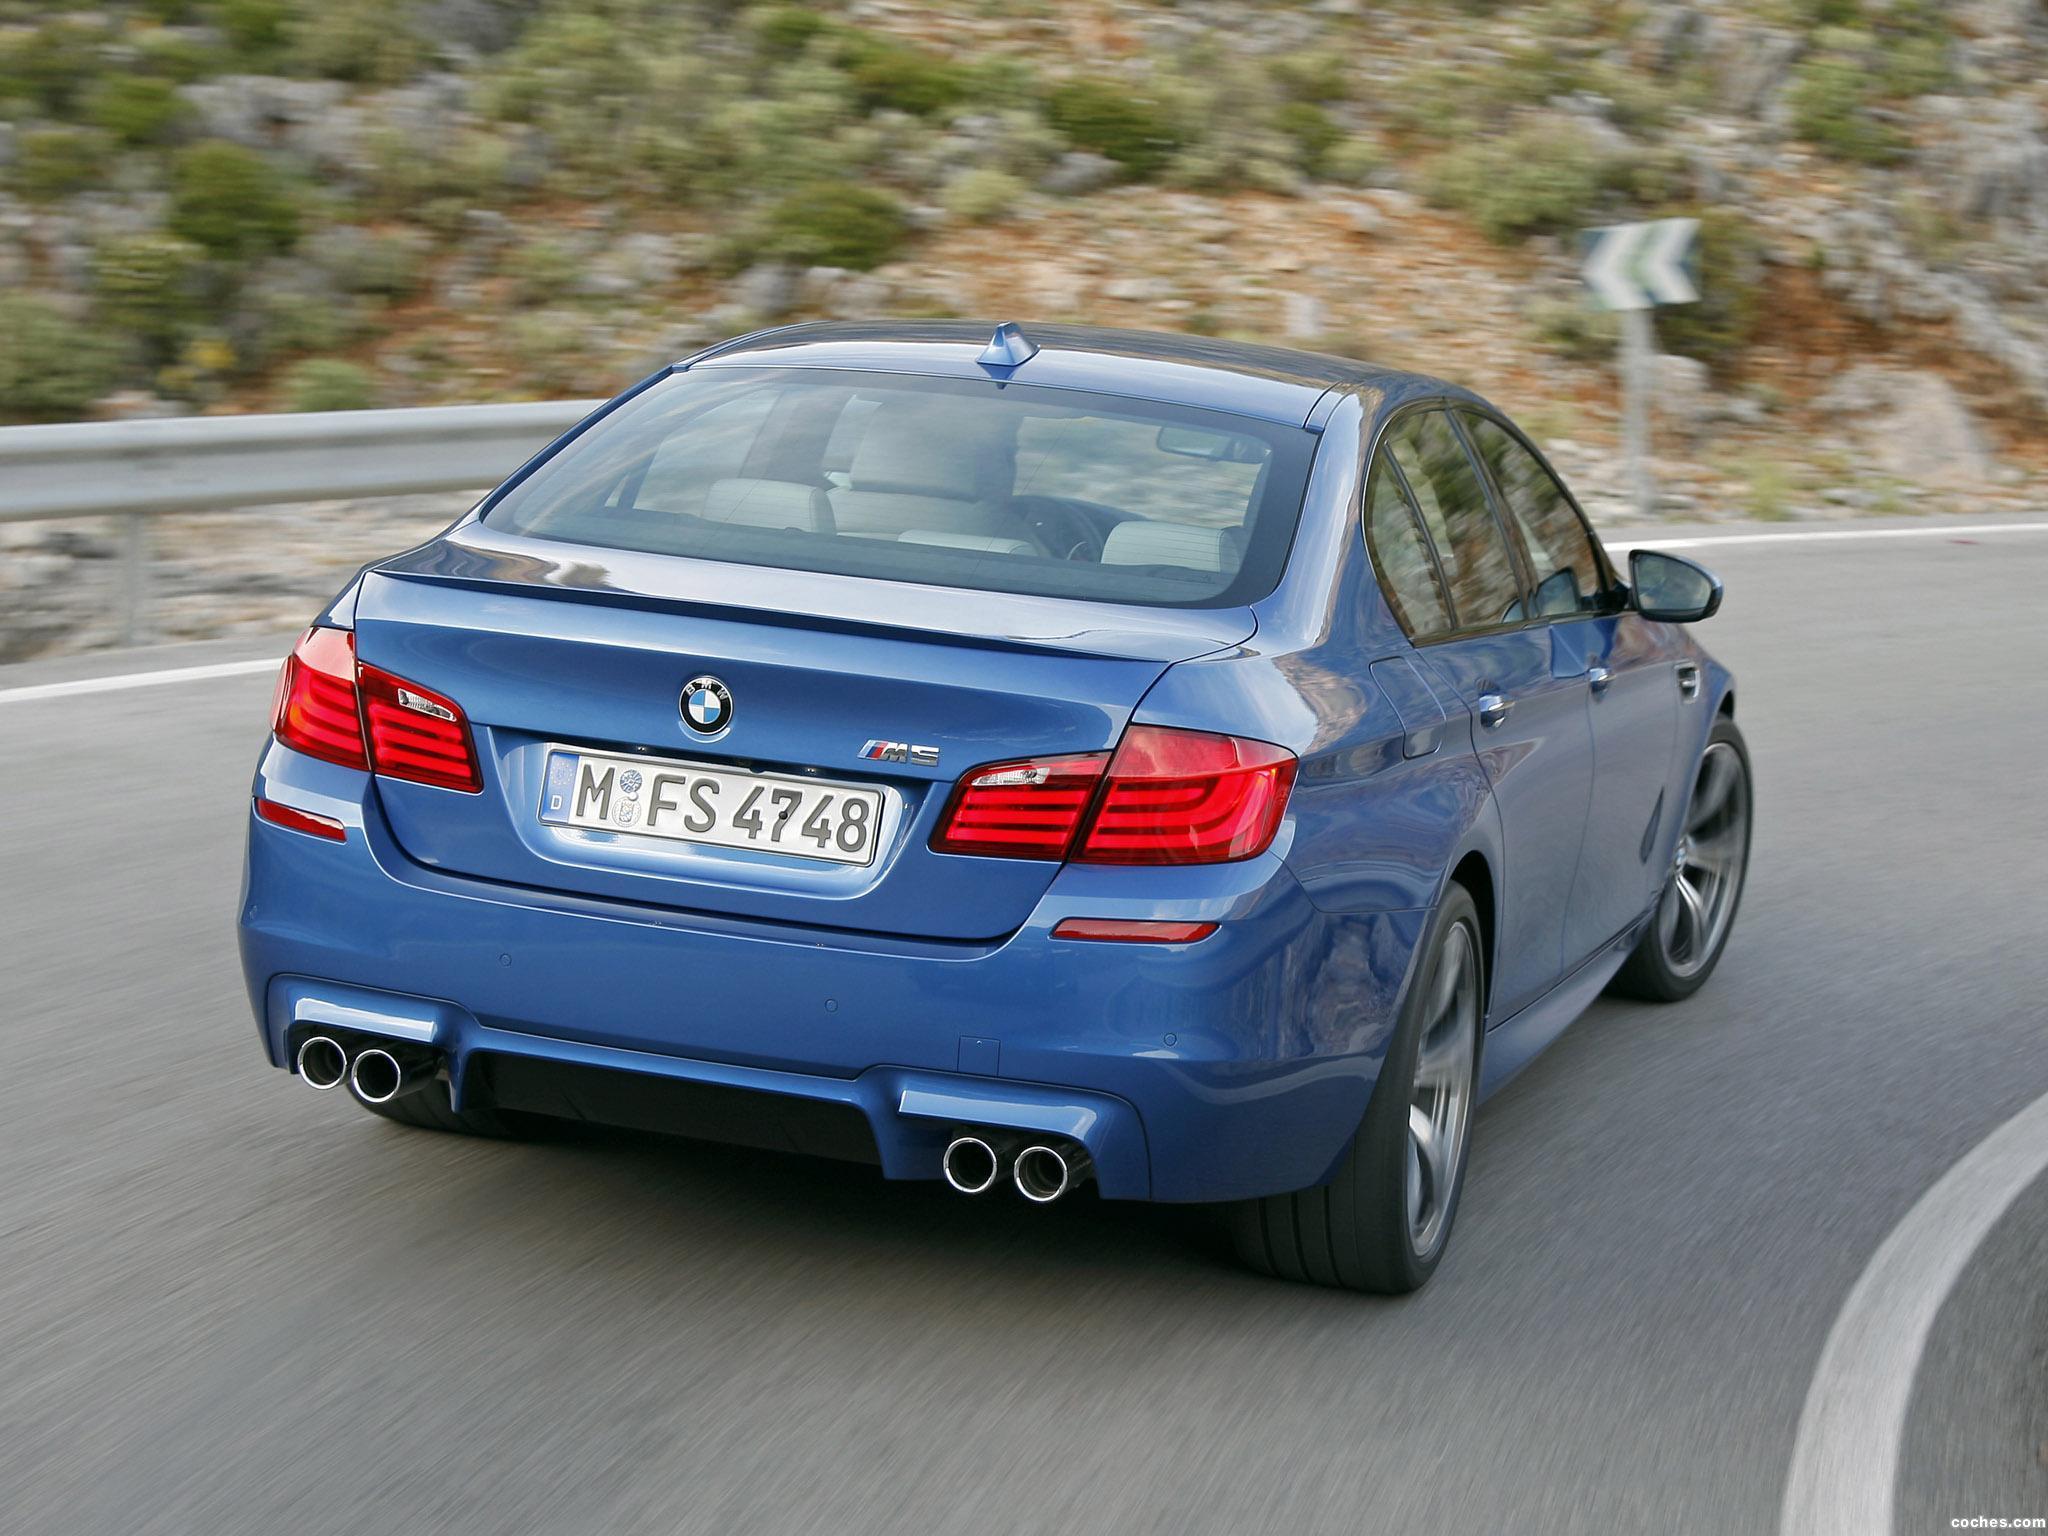 Foto 11 de BMW M5 Sedan F10 2011